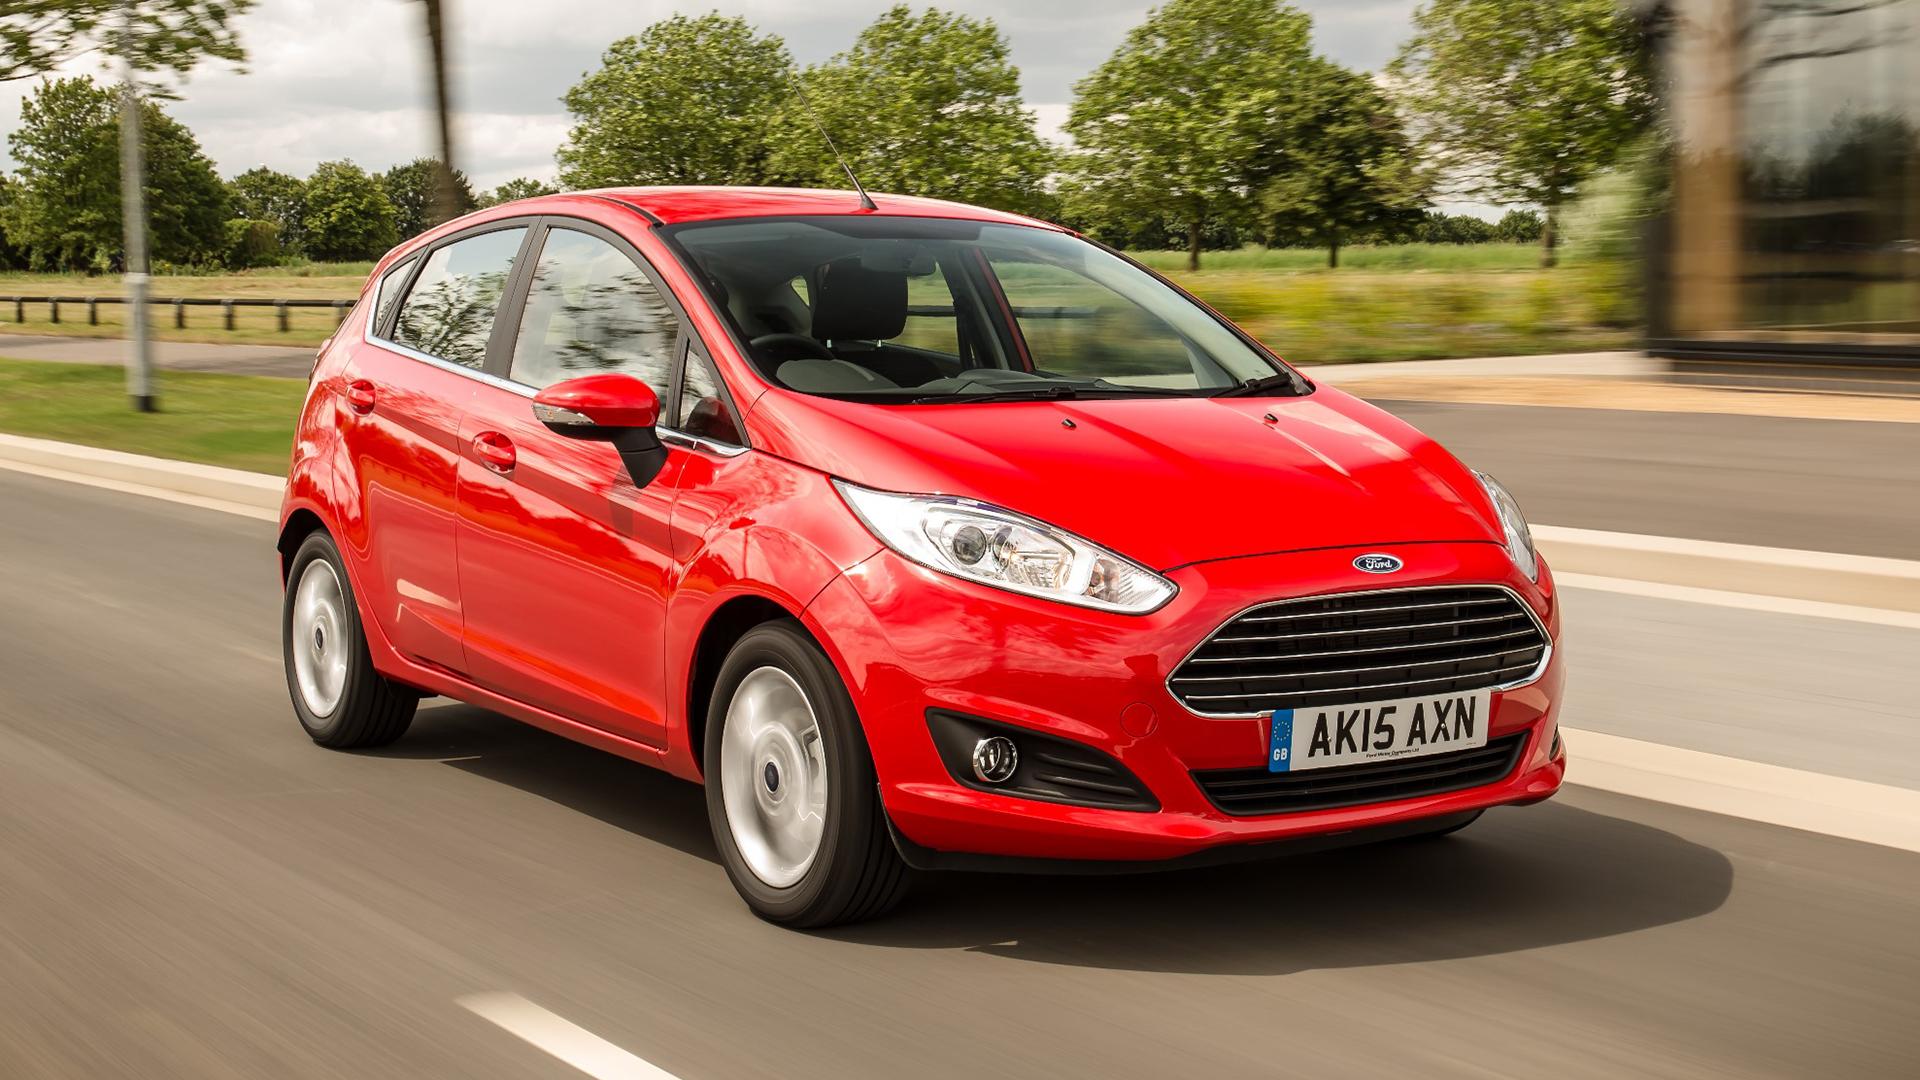 Ford Fiesta & Top 5 best First Cars   Auto Trader UK markmcfarlin.com